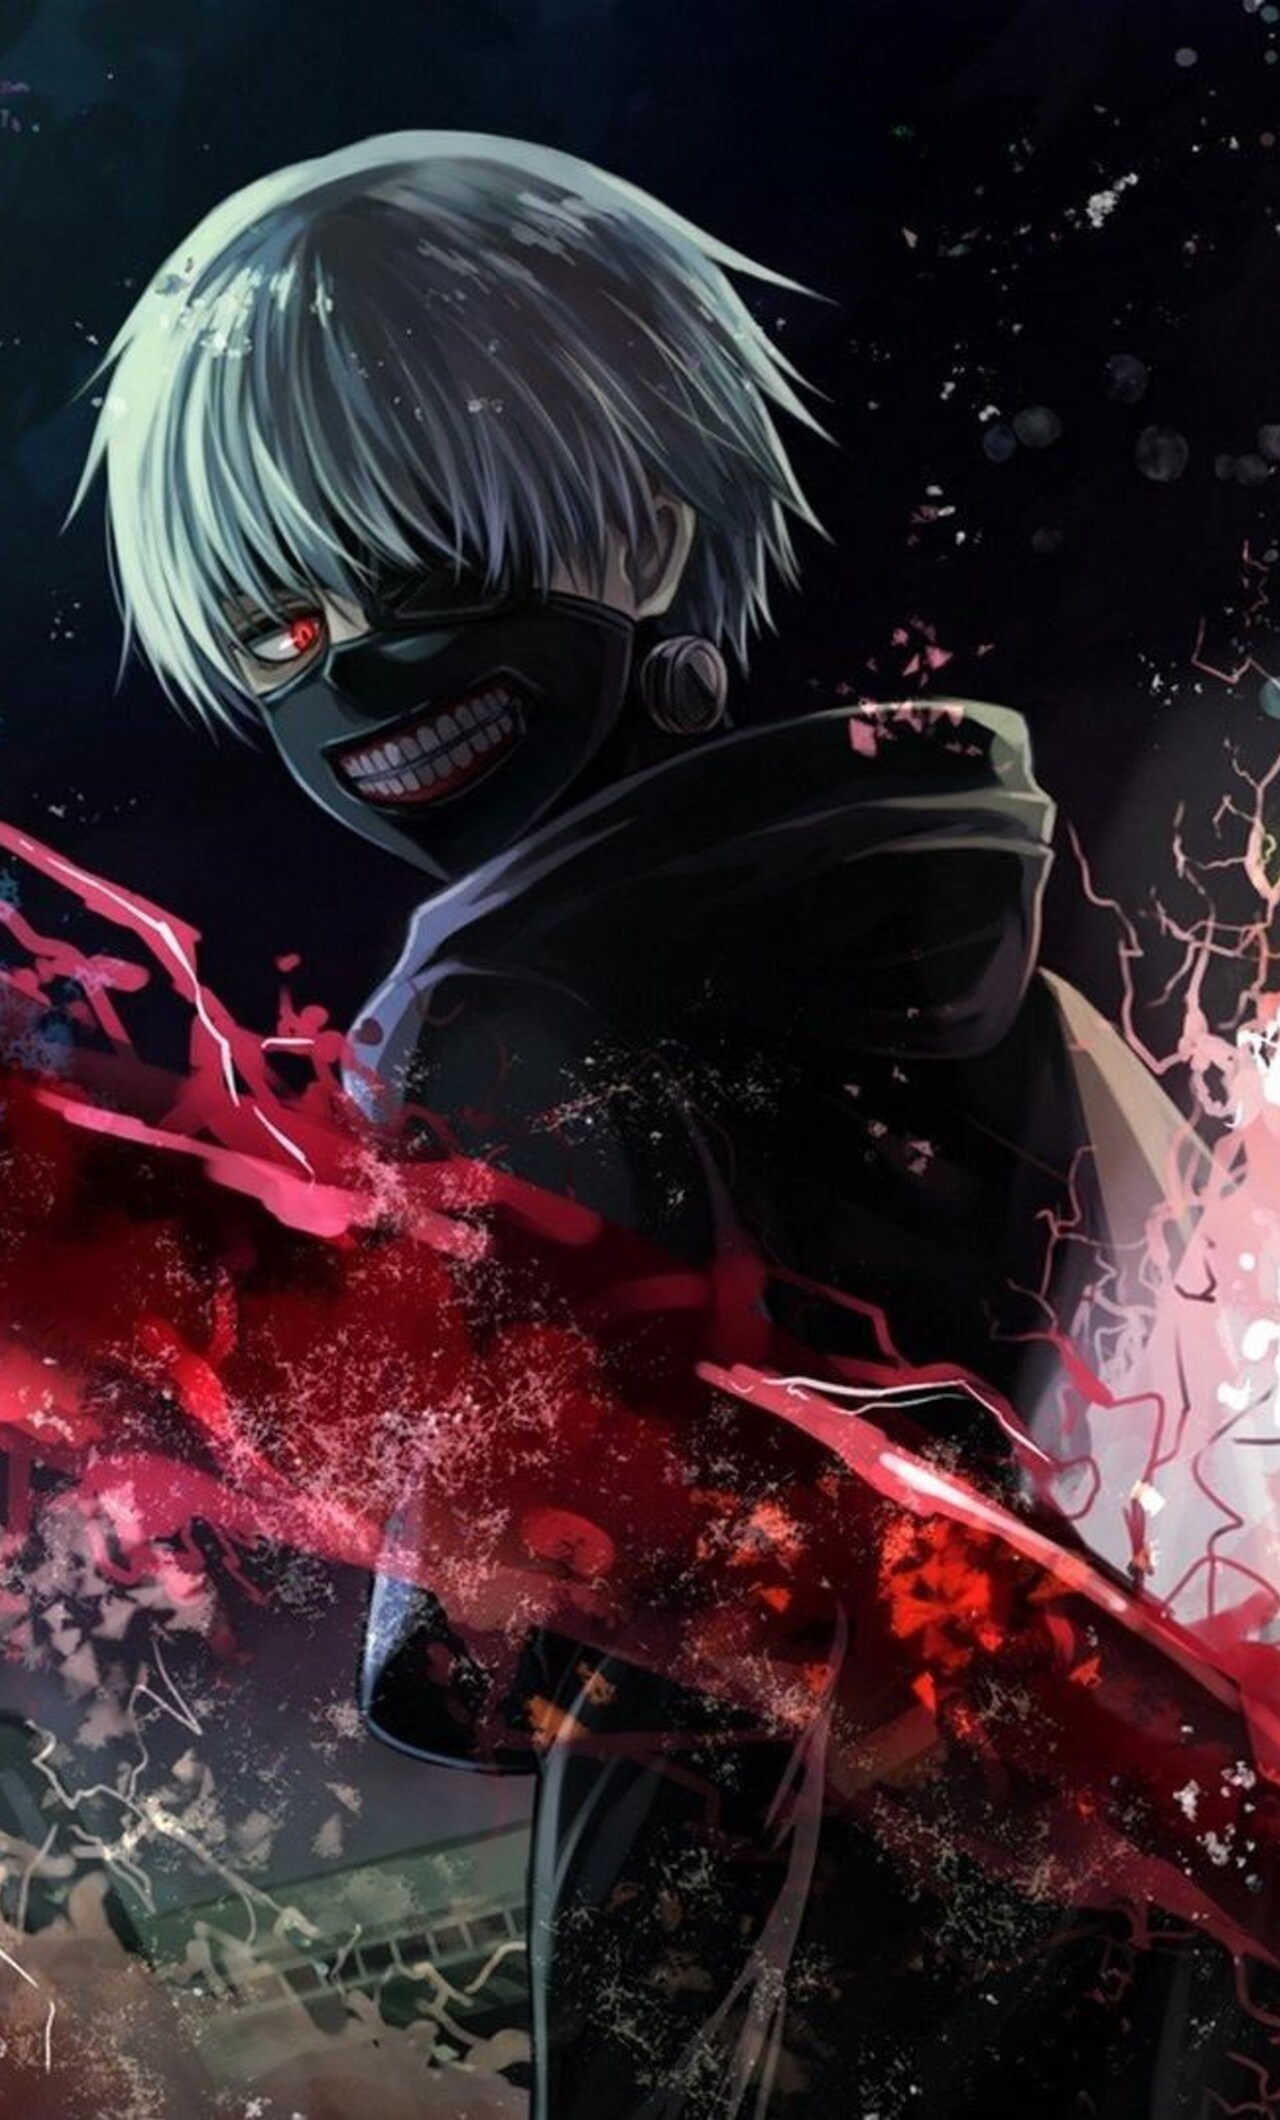 tokyo-ghoul-art-pic.jpg